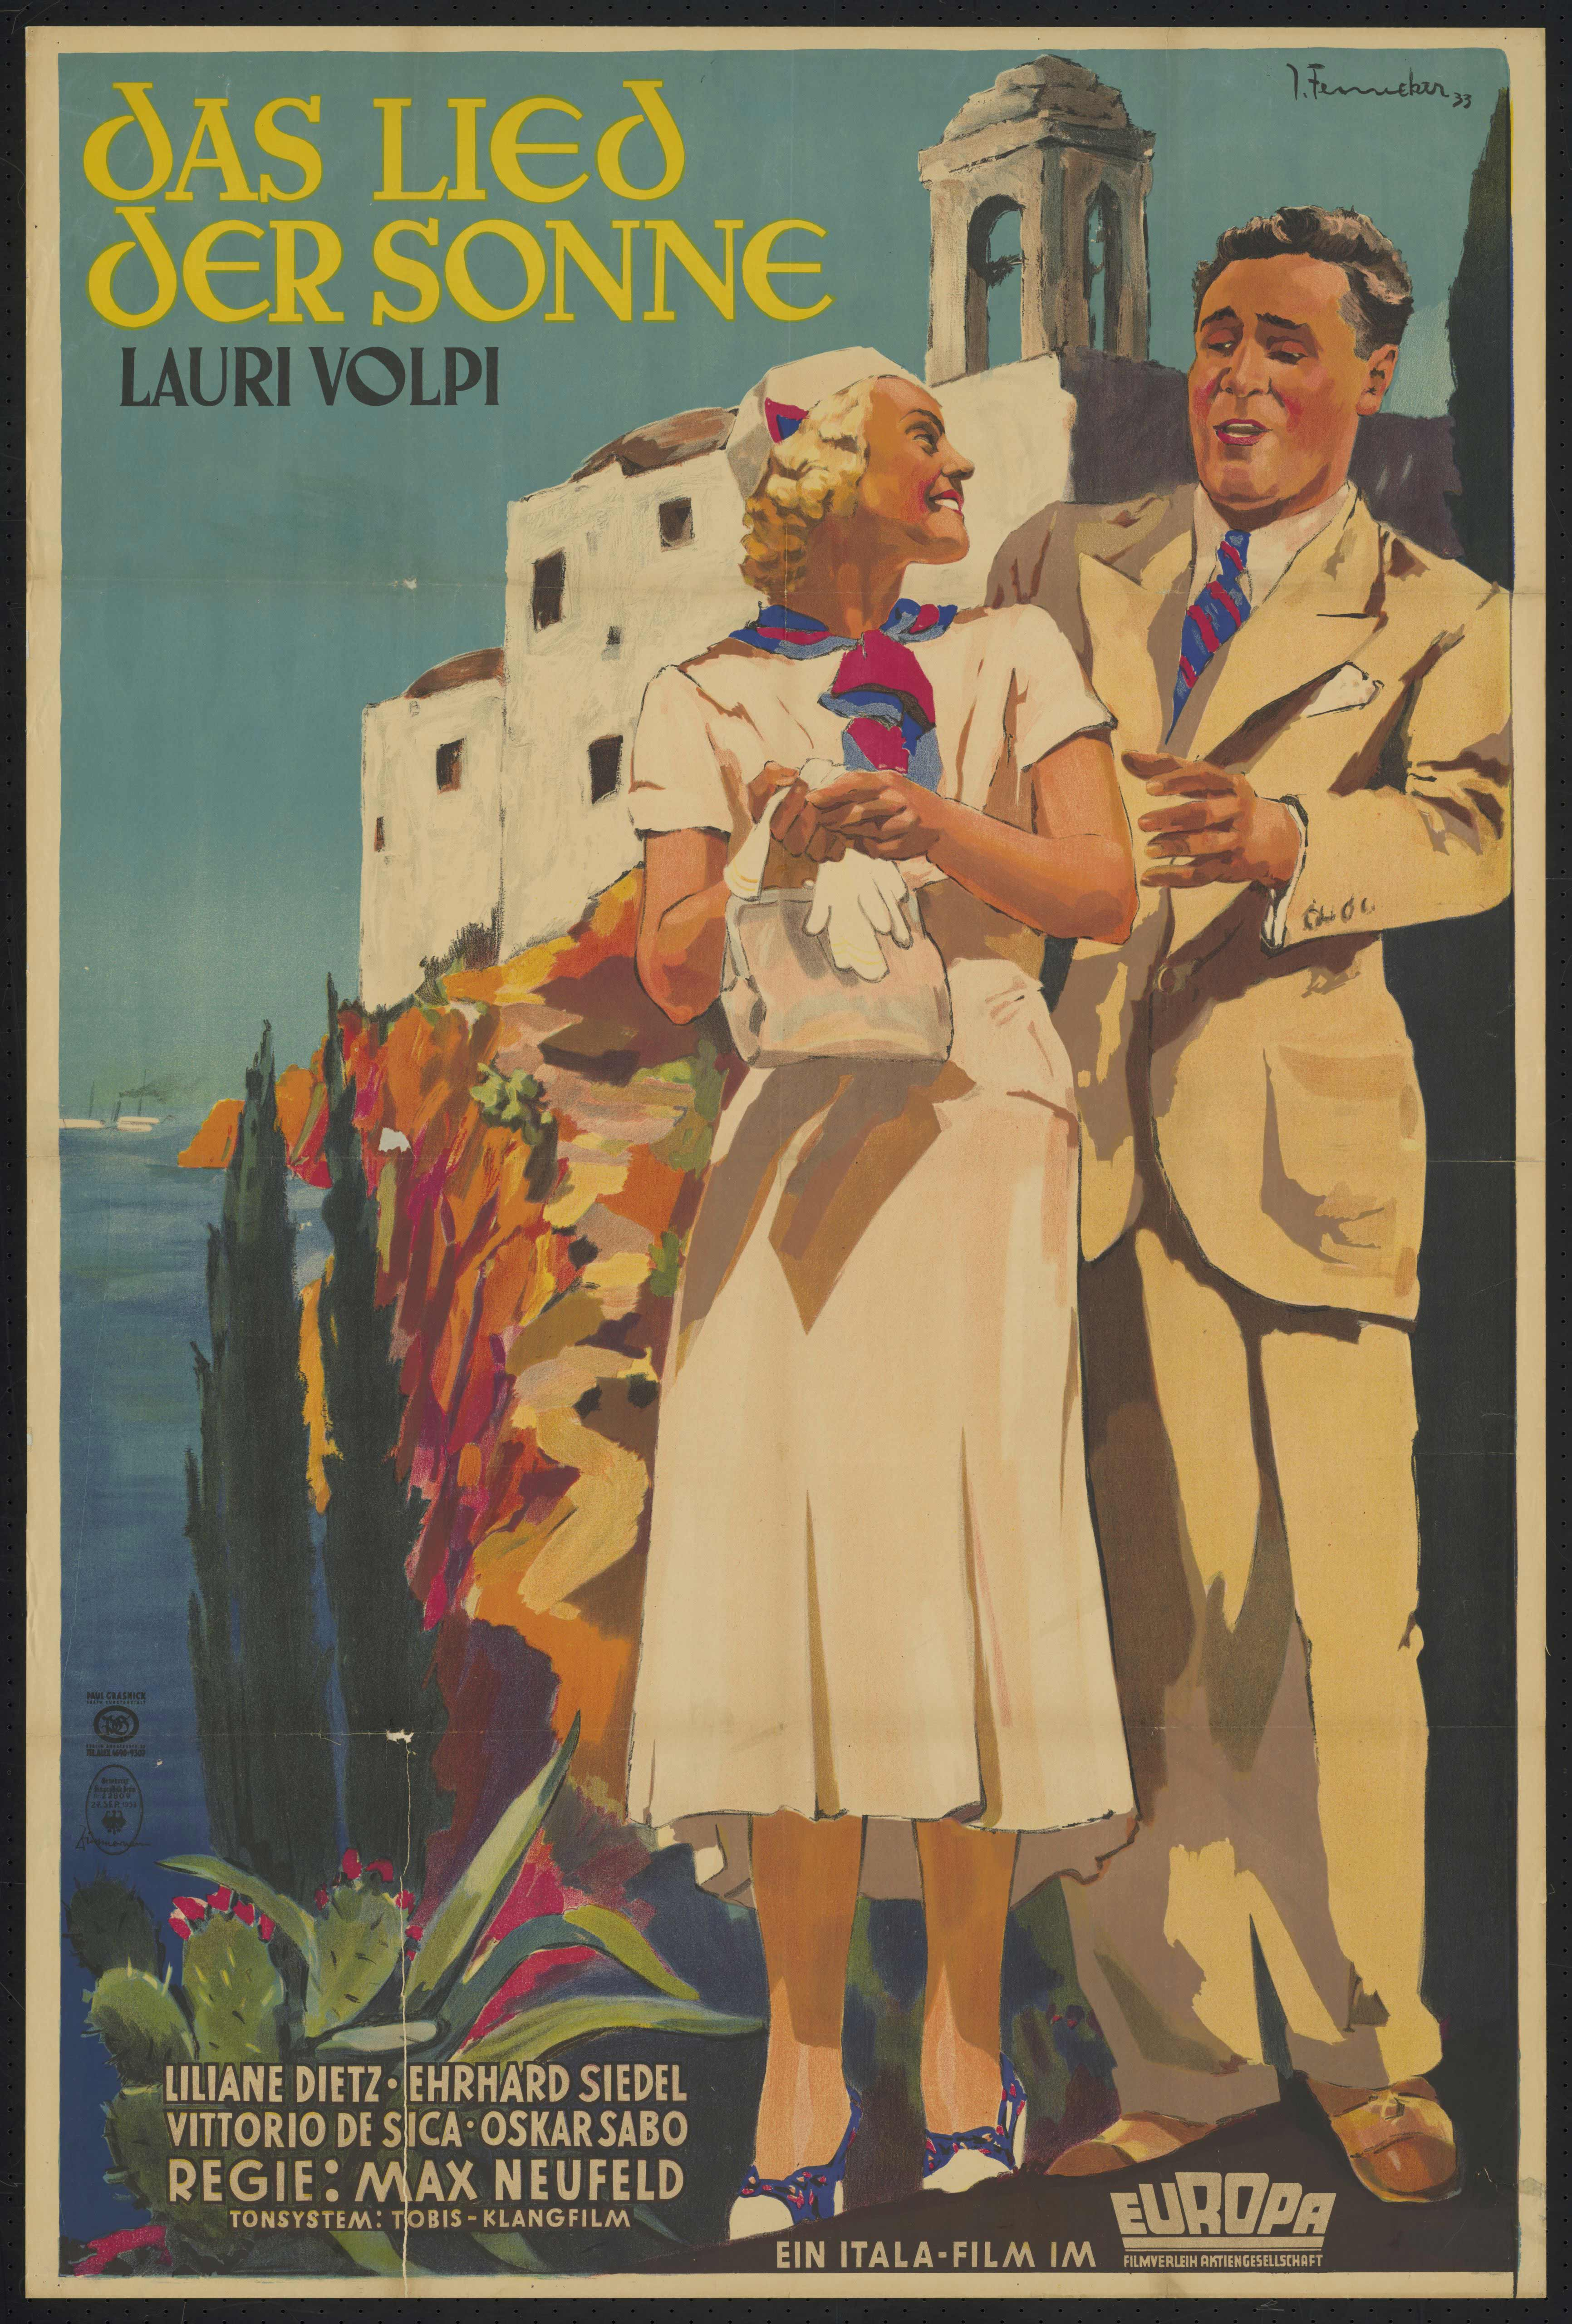 Film poster by Josef Fenneker: Das Lied der Sonne, Germany 1933, directed by Max Neufeld